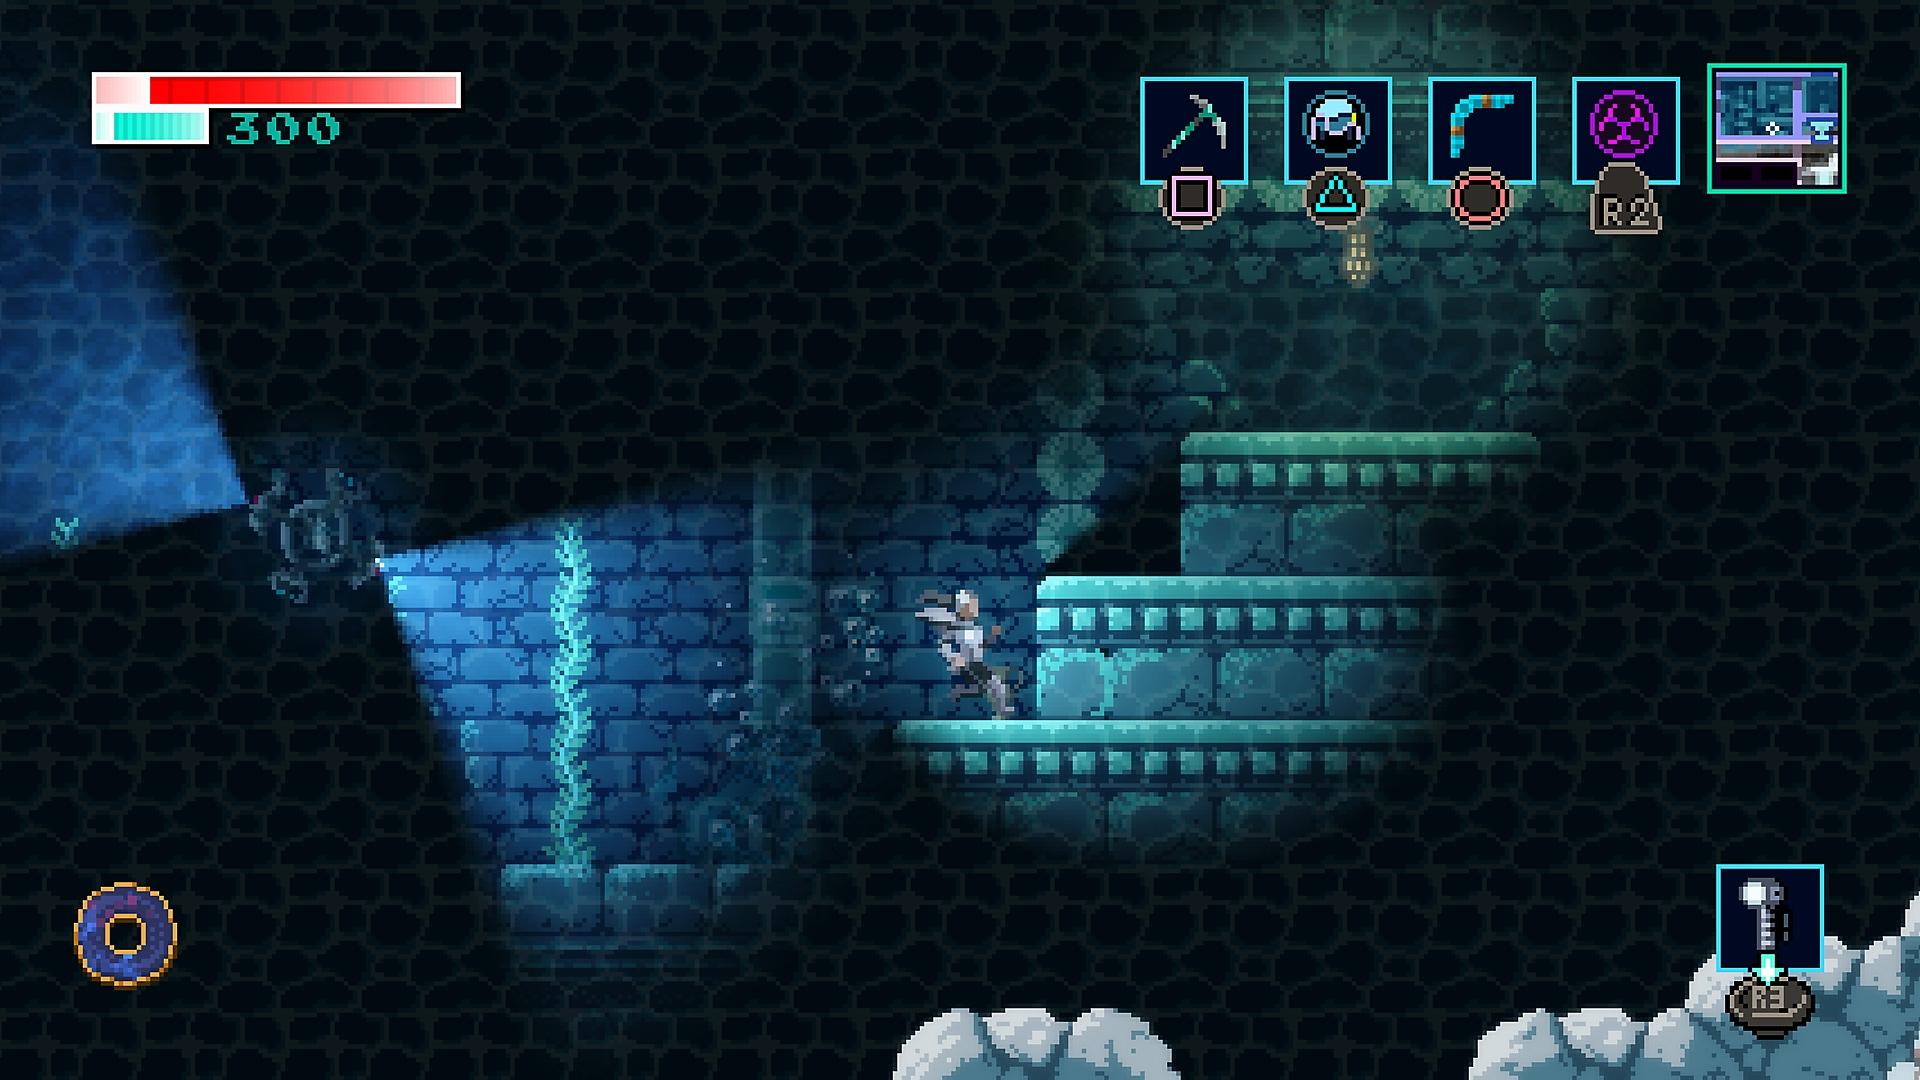 Axiom Verge 2 - reveal screenshot